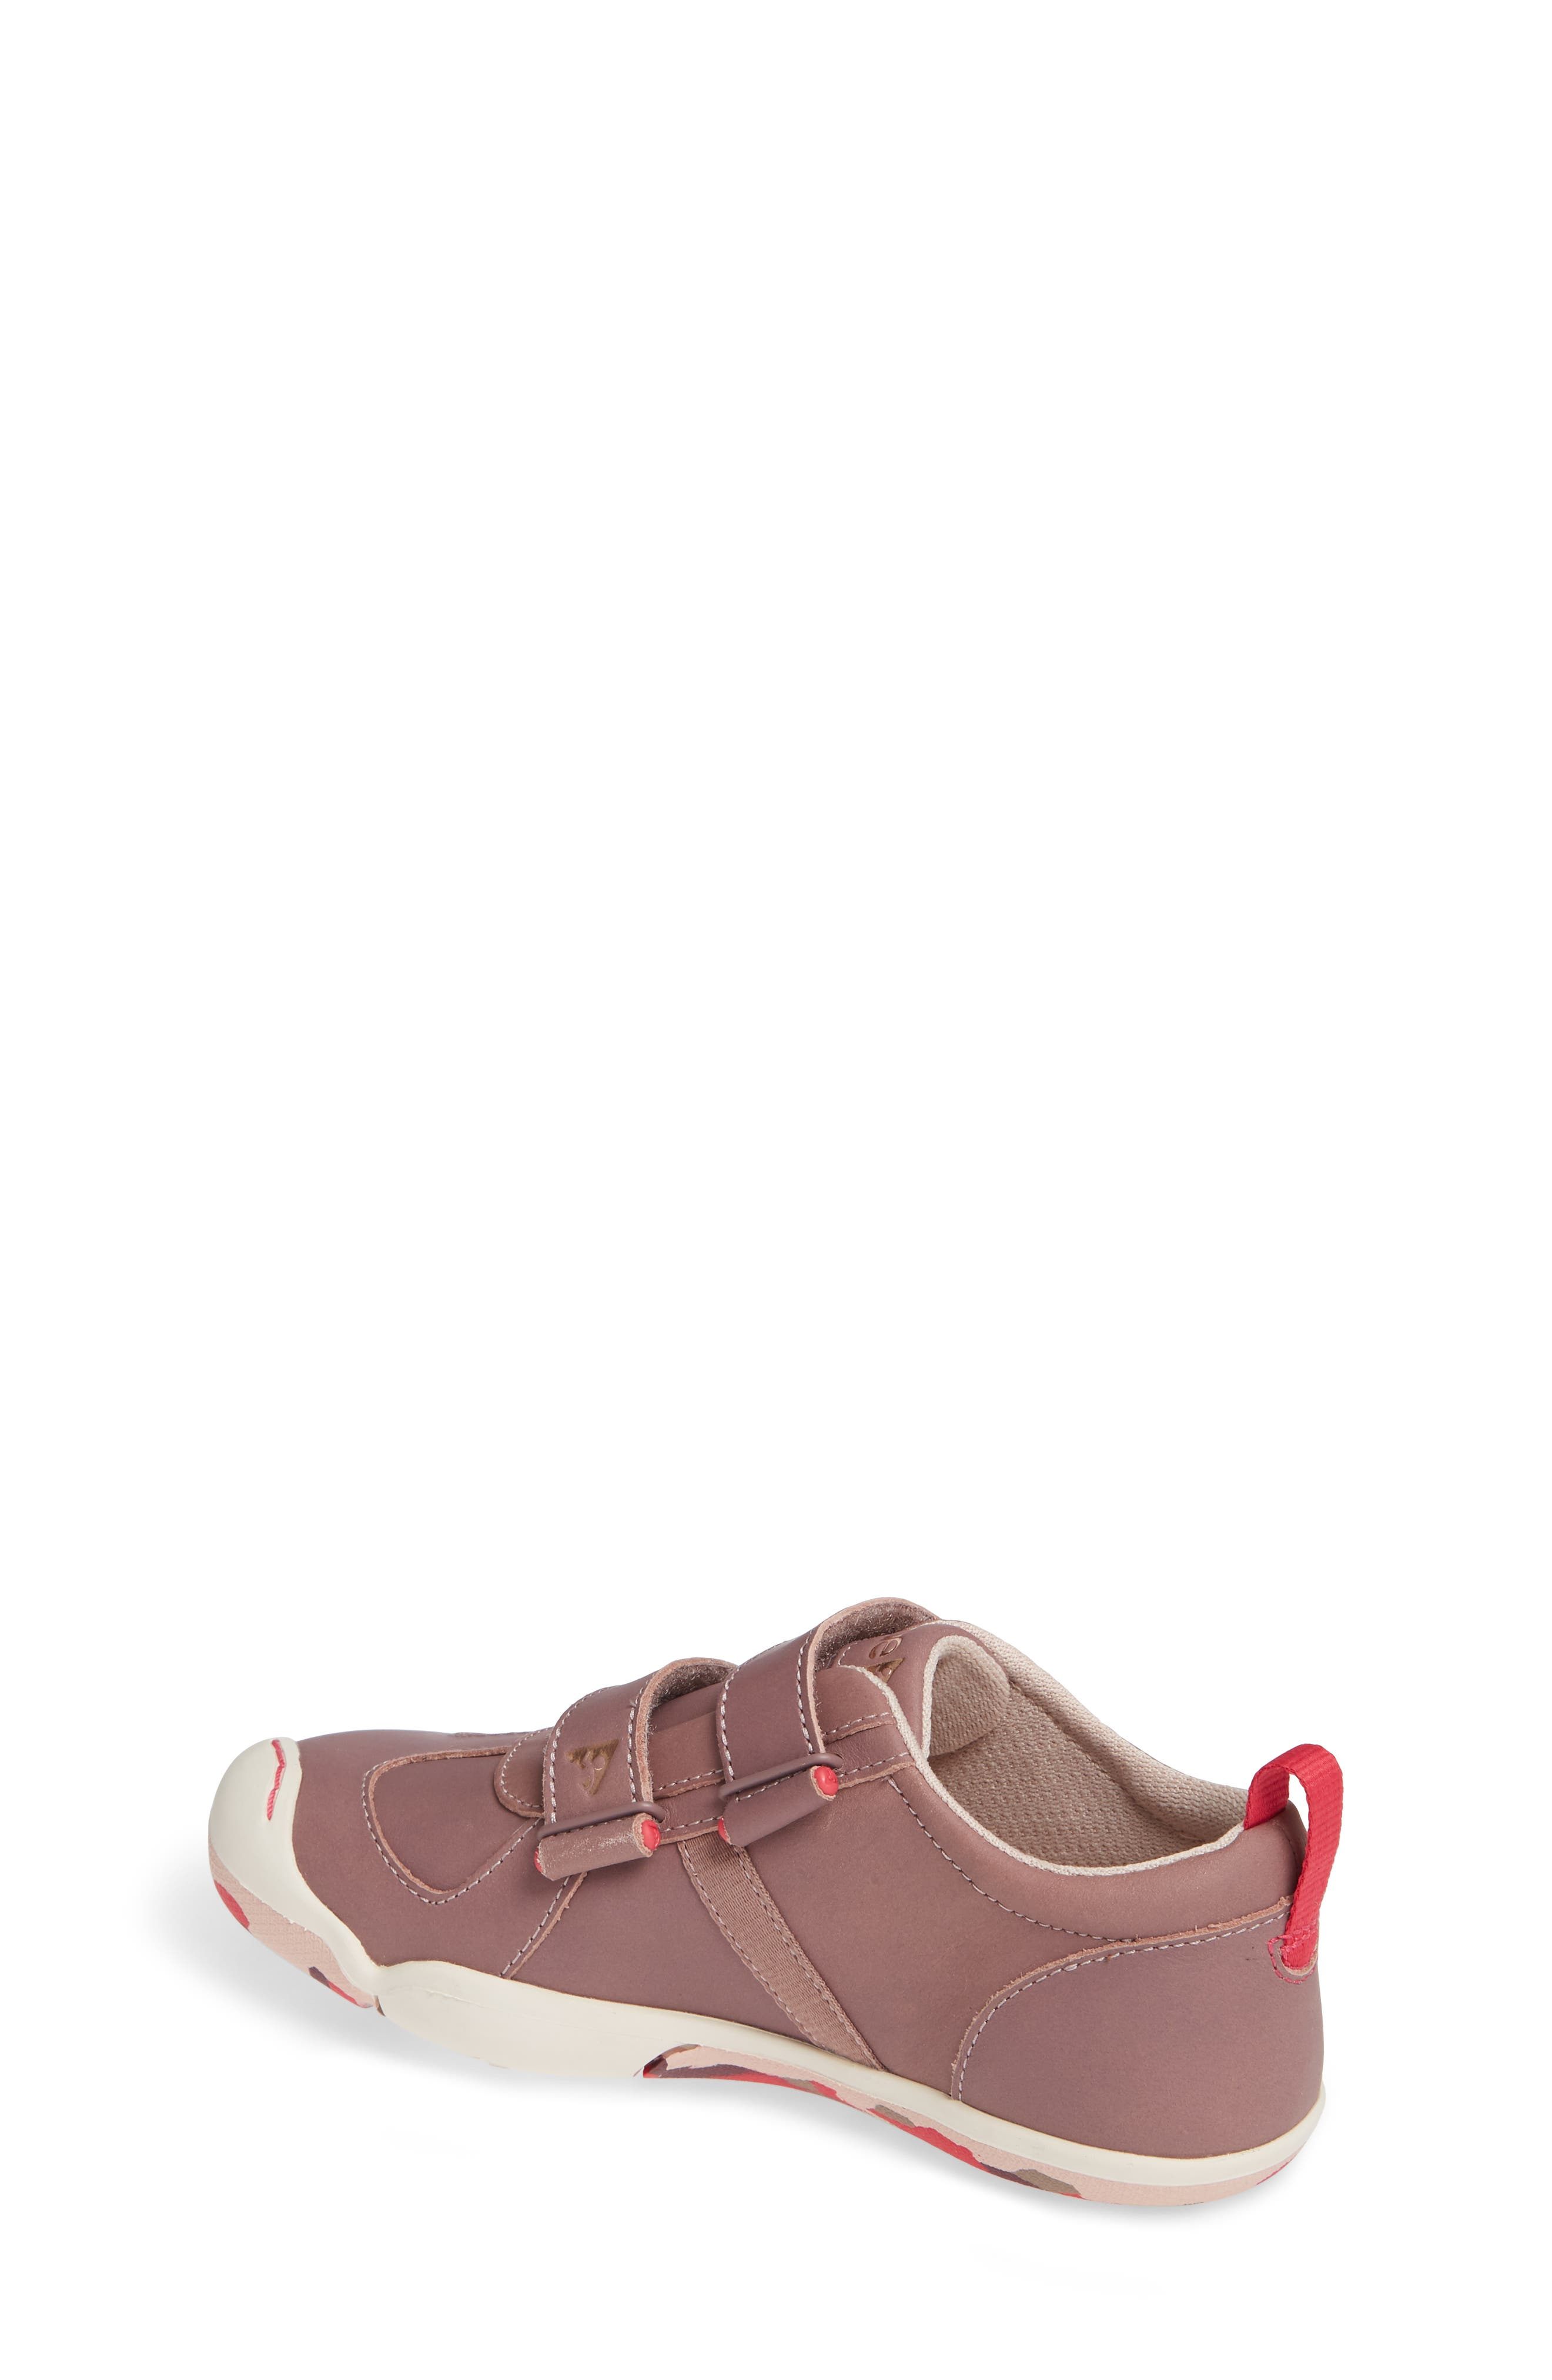 Nat Customizable Sneaker,                             Alternate thumbnail 2, color,                             SILTSTONE